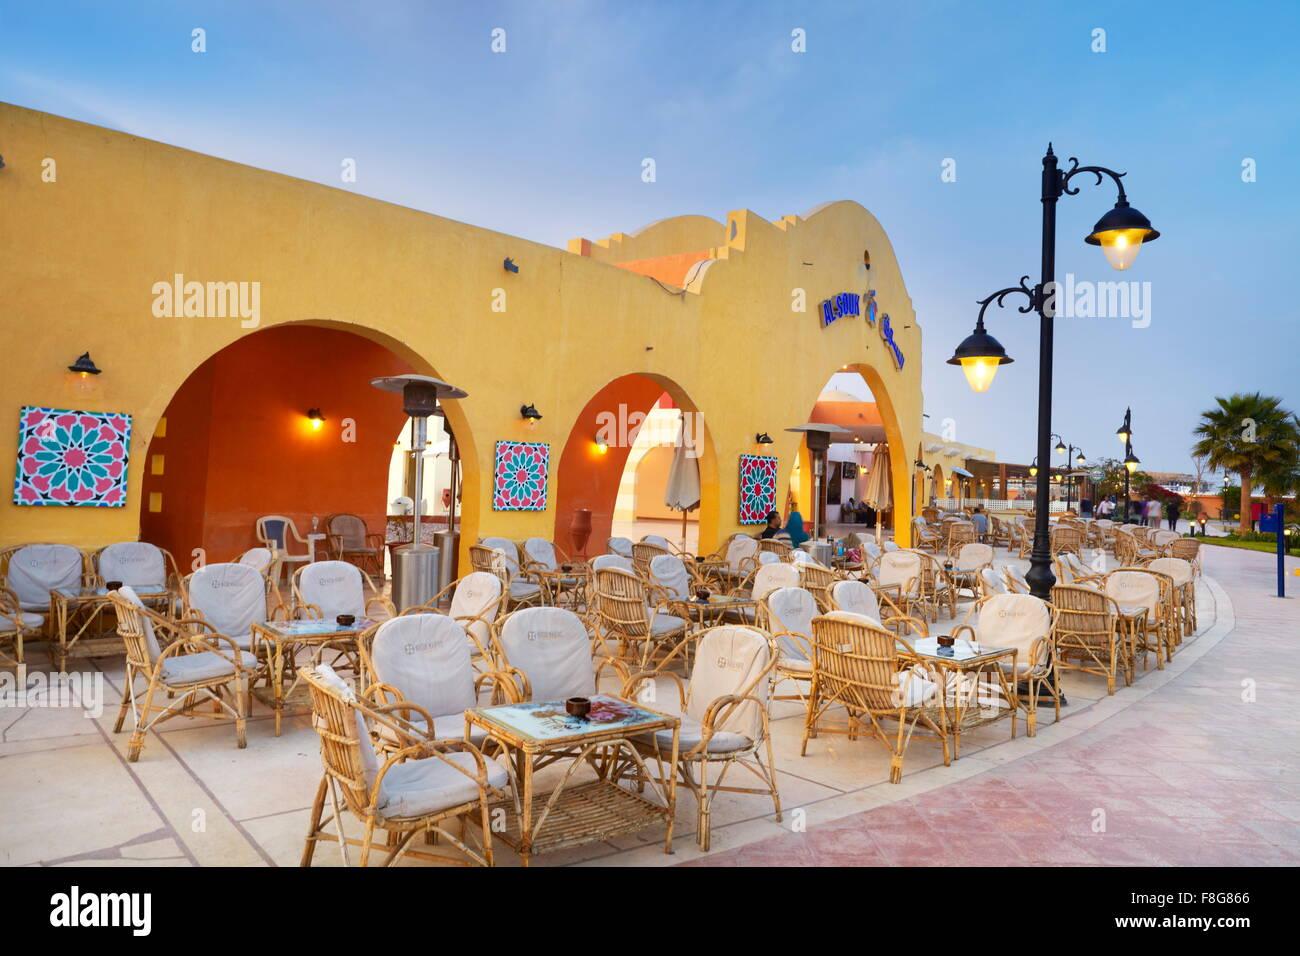 Egypt - Hurghada, Marina, promenade by night - Stock Image